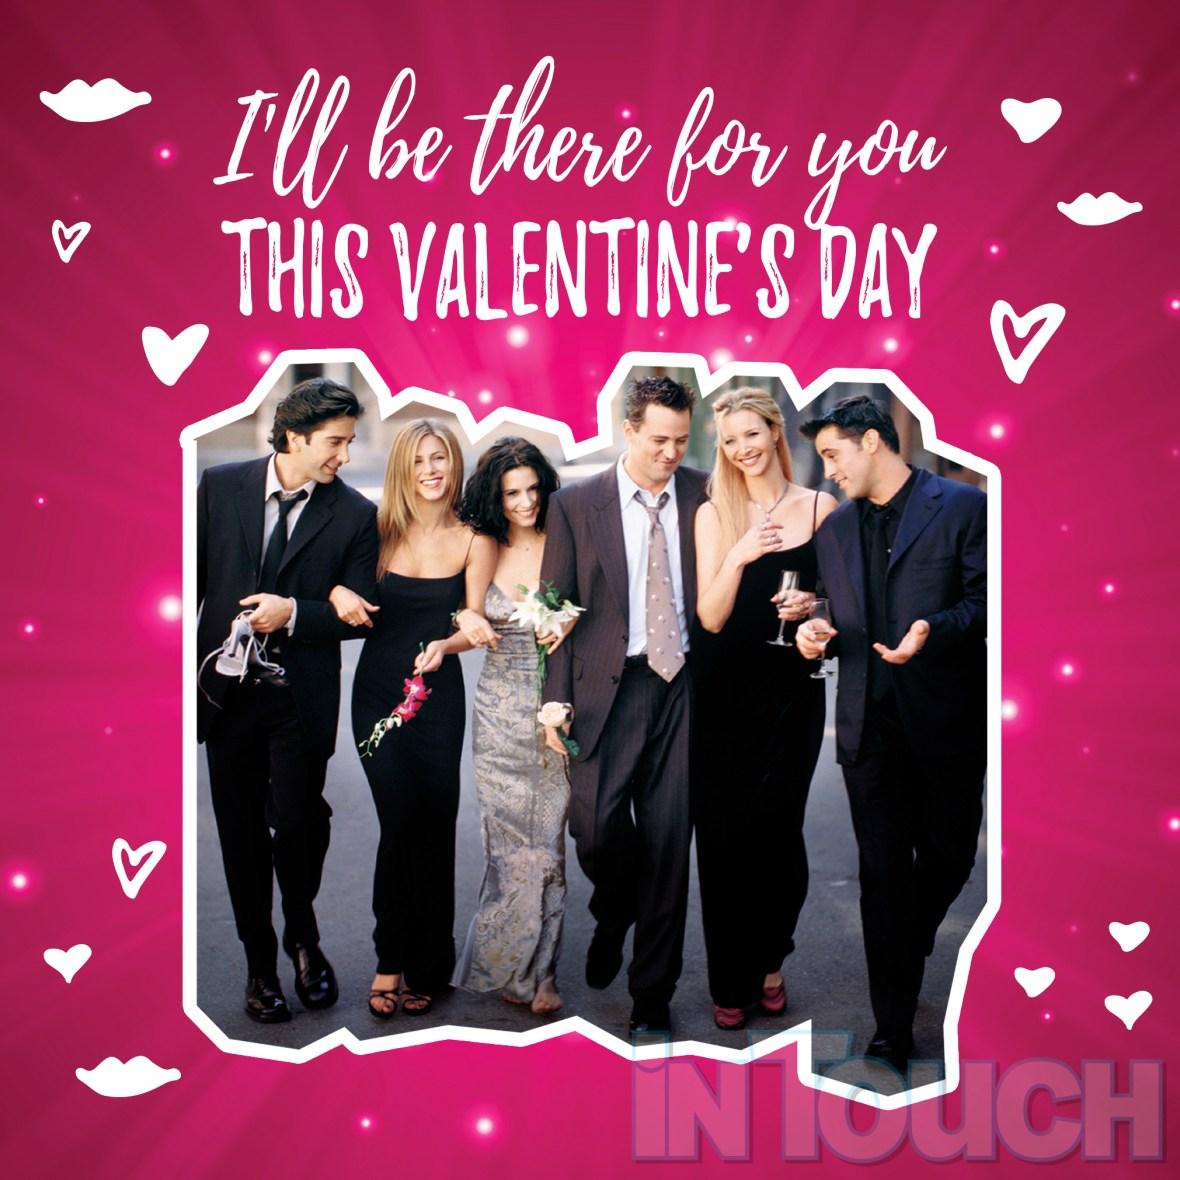 friends valentine's day card 5